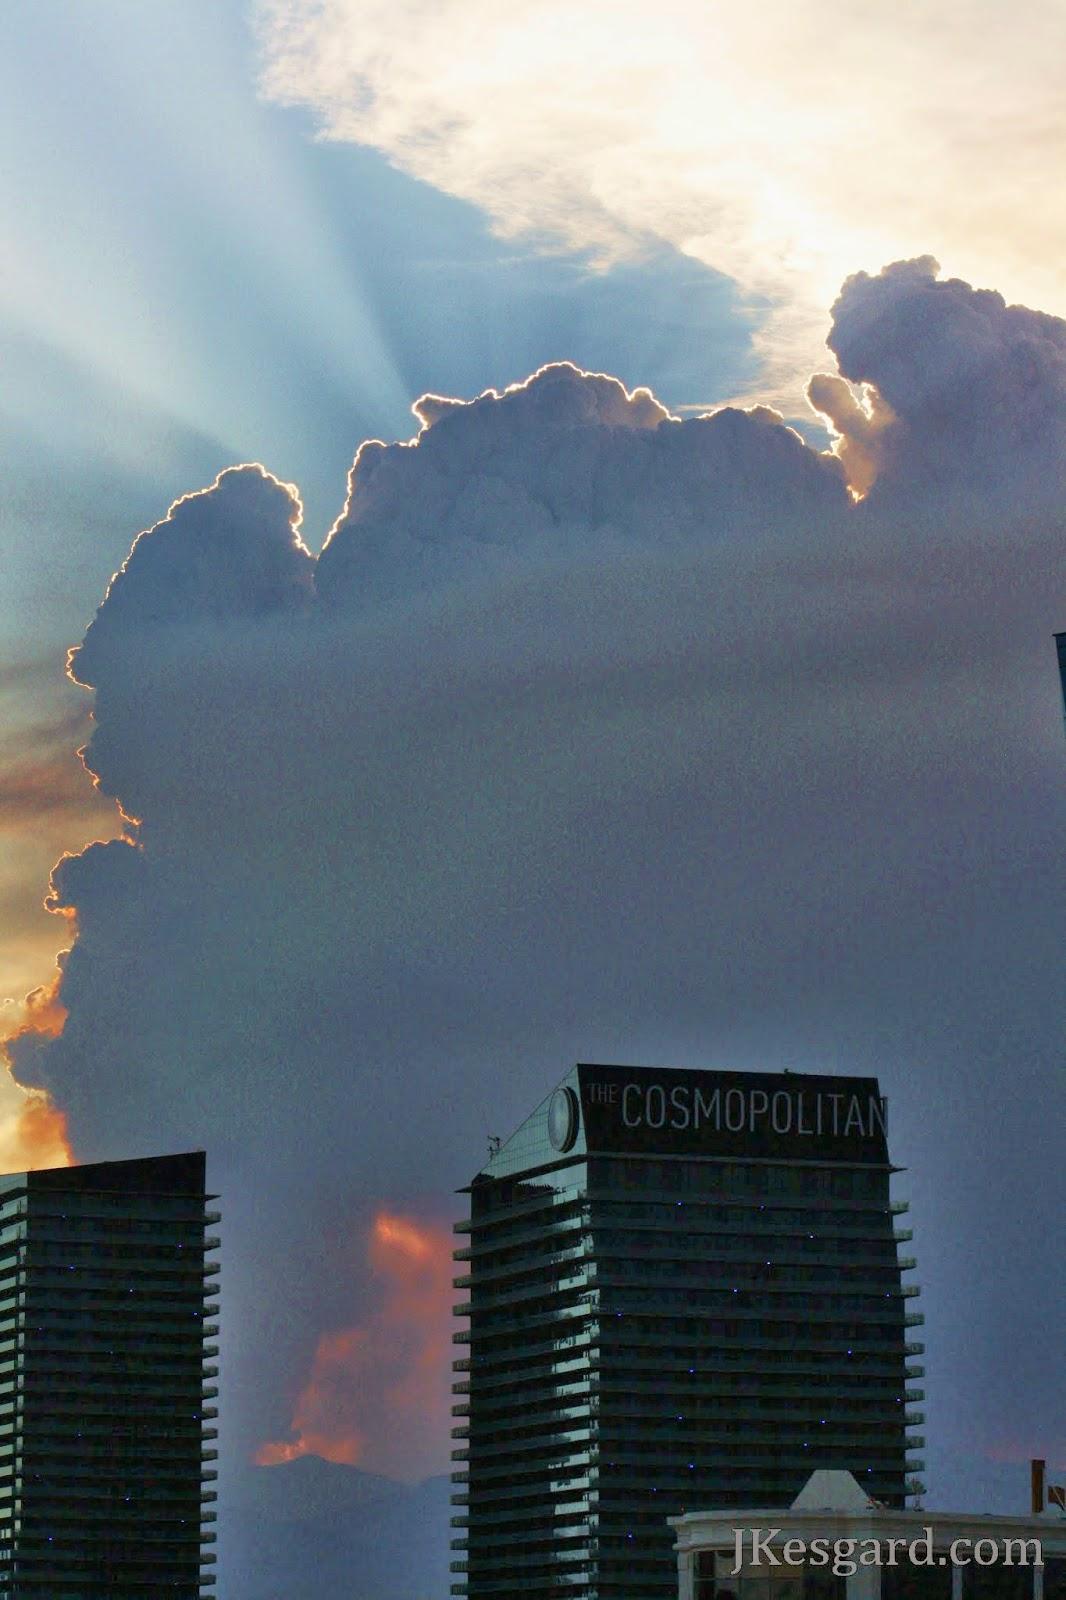 Wildfire in Las Vegas July 2013, smoke column with fire glow.